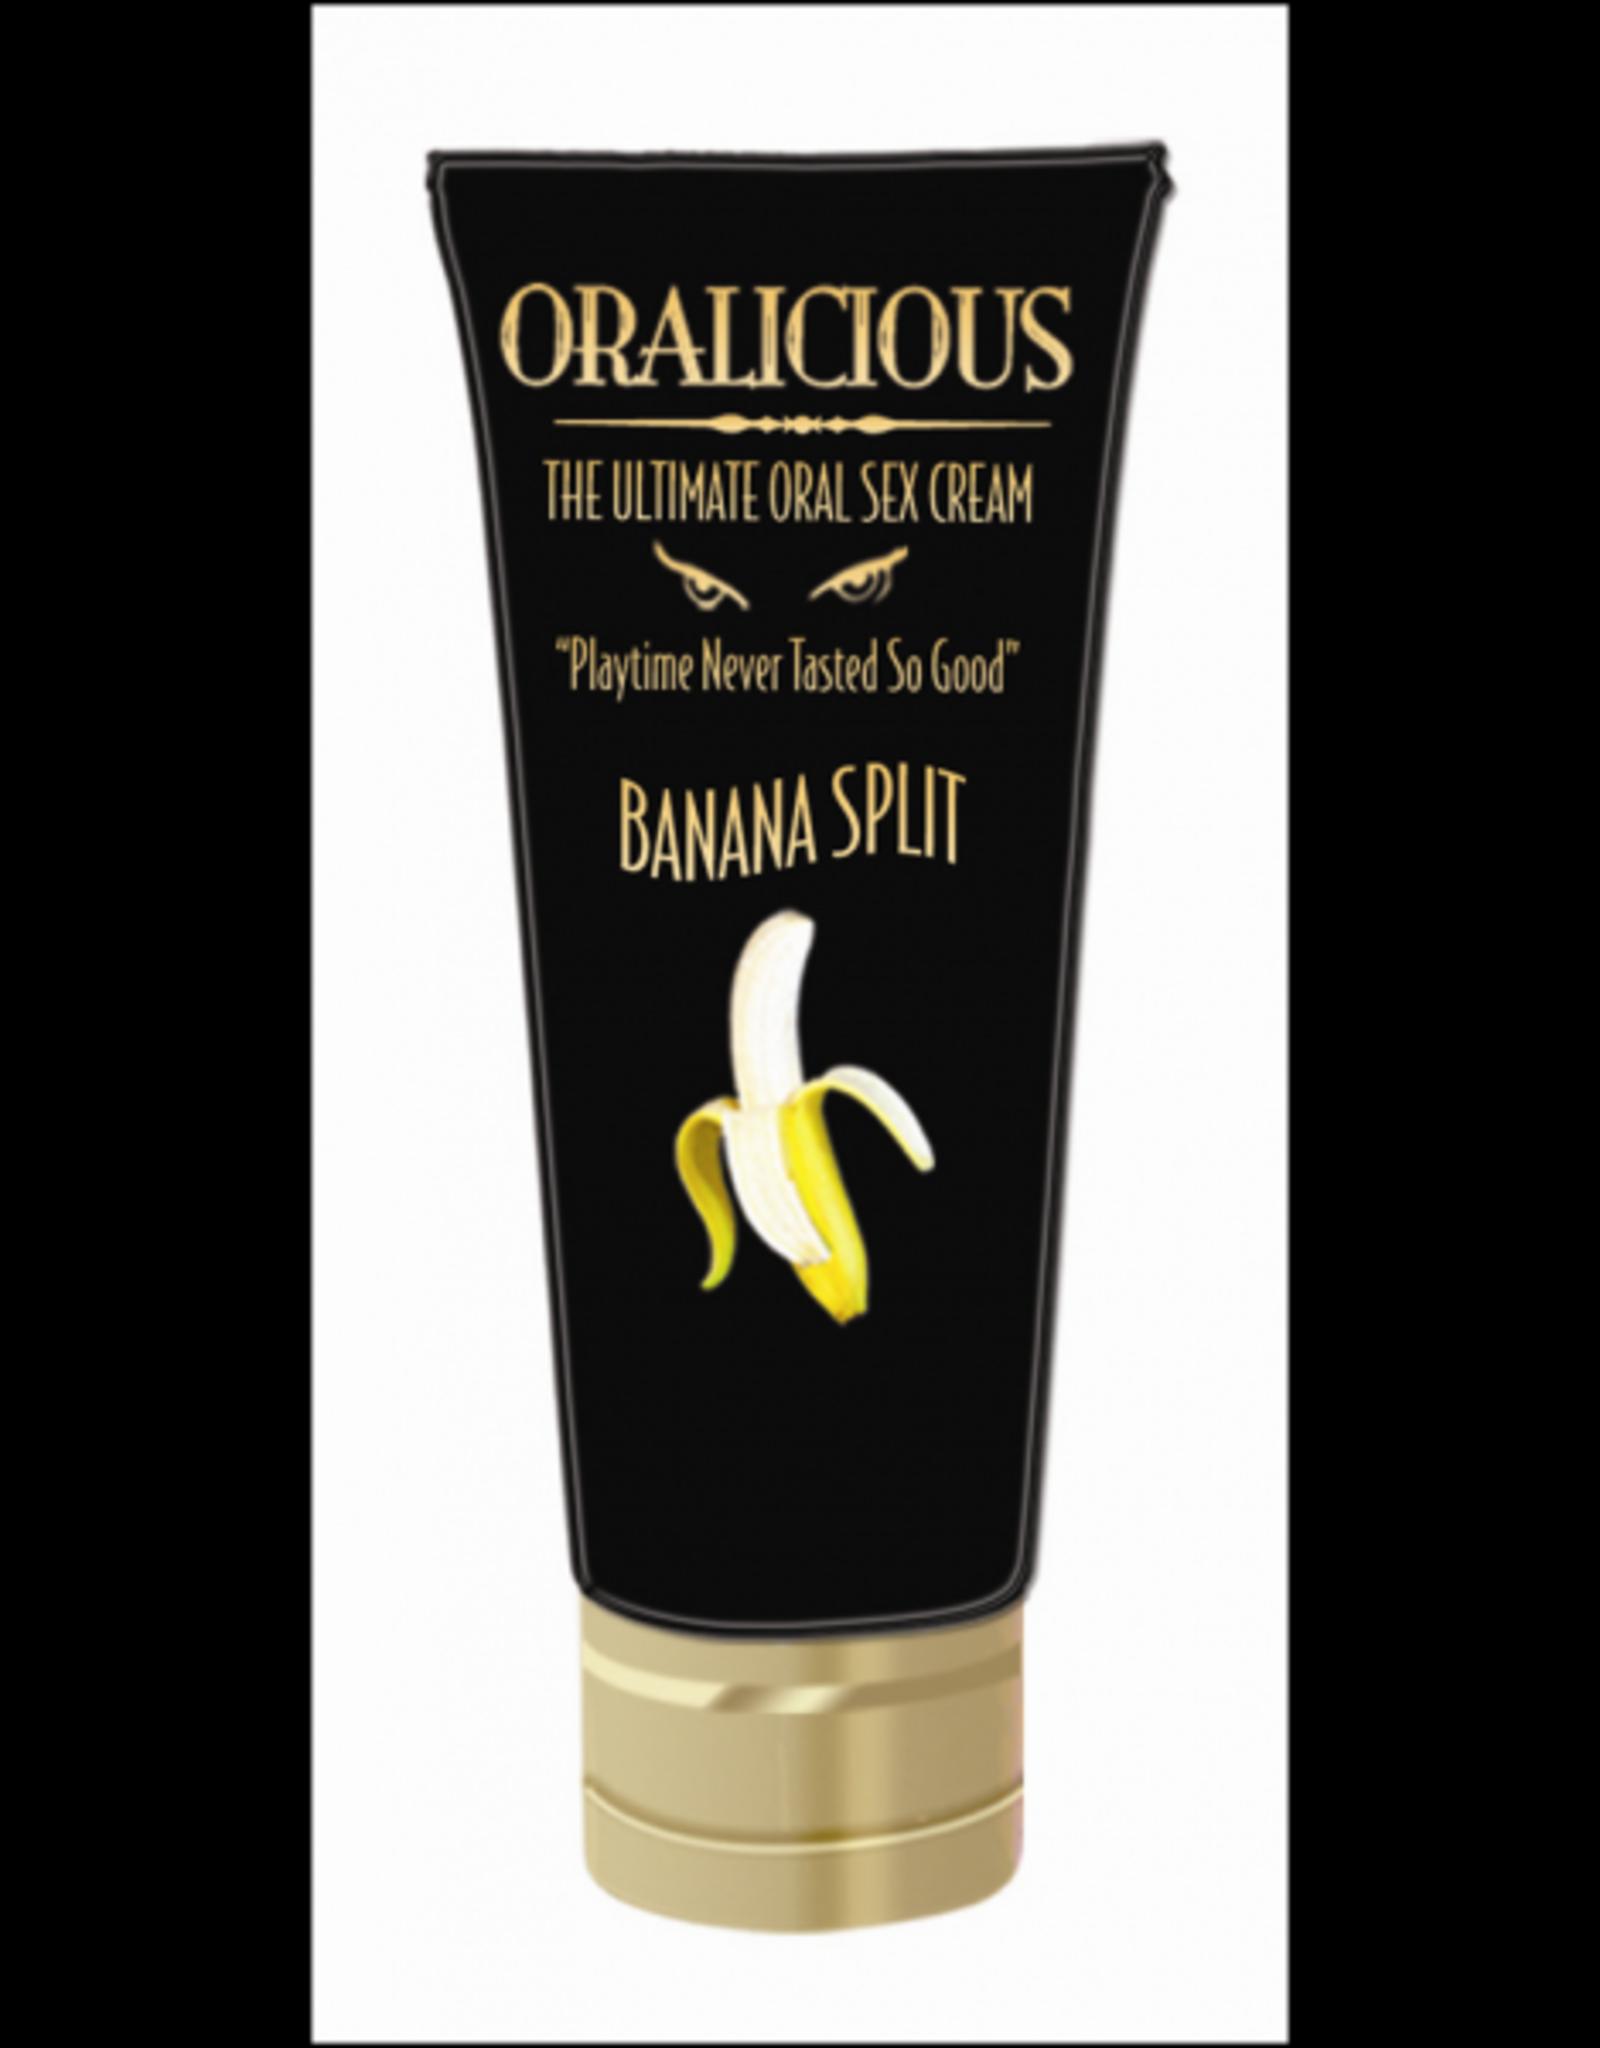 Oralicious - Ultimate Oral Sex Cream (Banana Split)